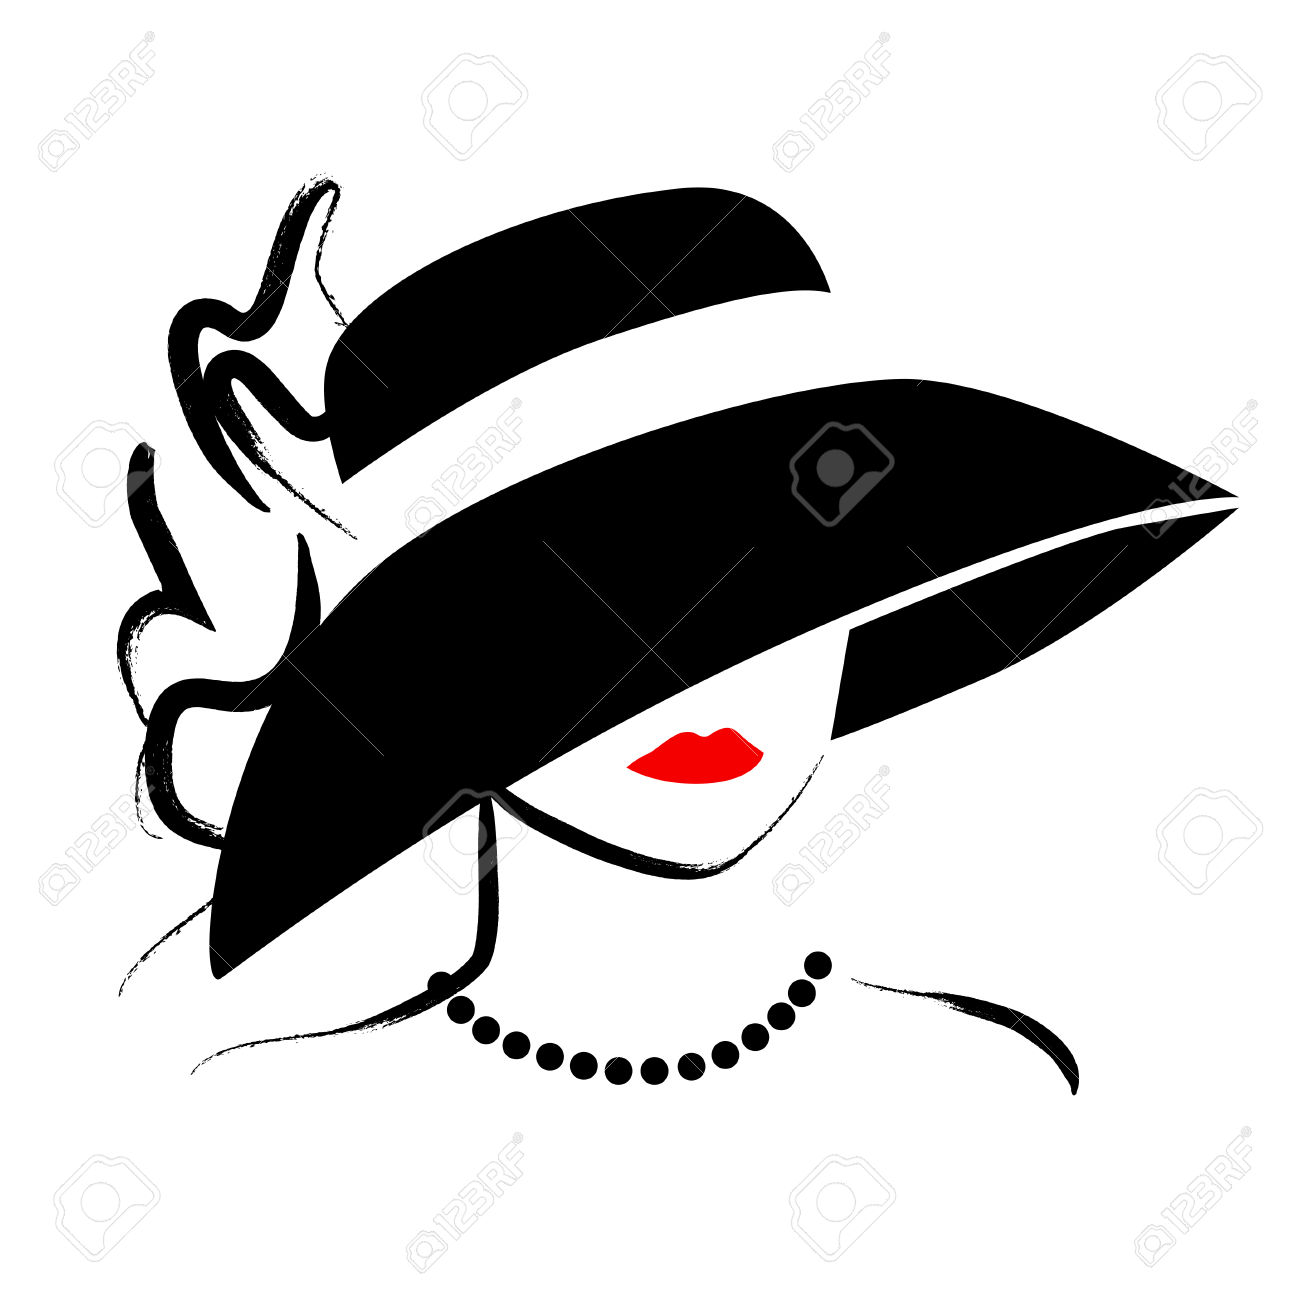 1300x1300 Drawn Top Hat Silhouette